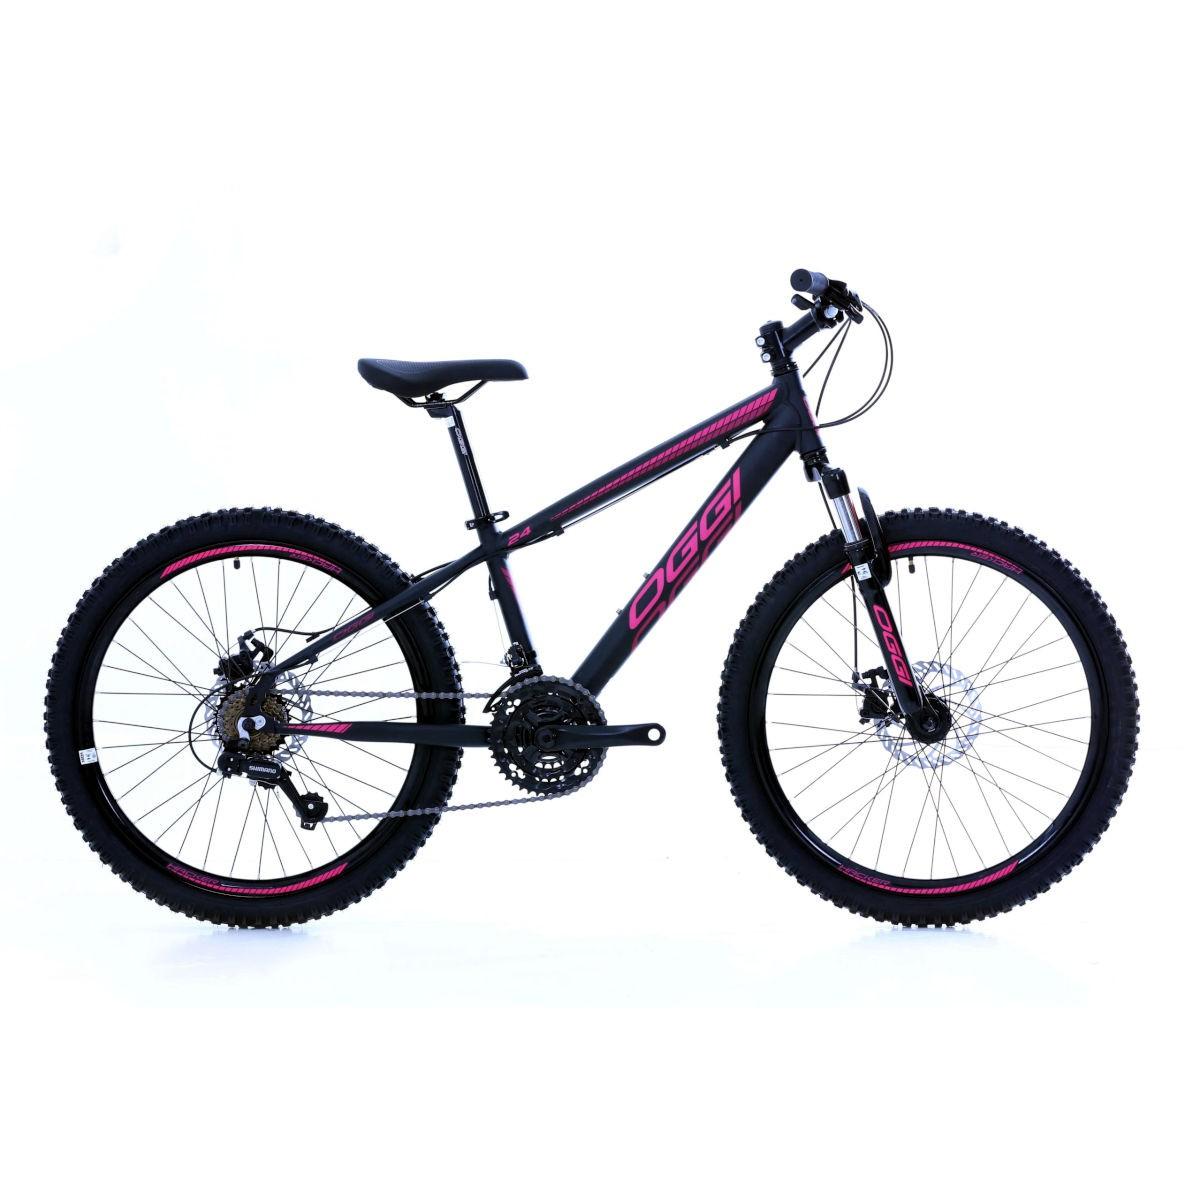 Bicicleta Oggi Hacker aro 24 21v  Preto/Rosa